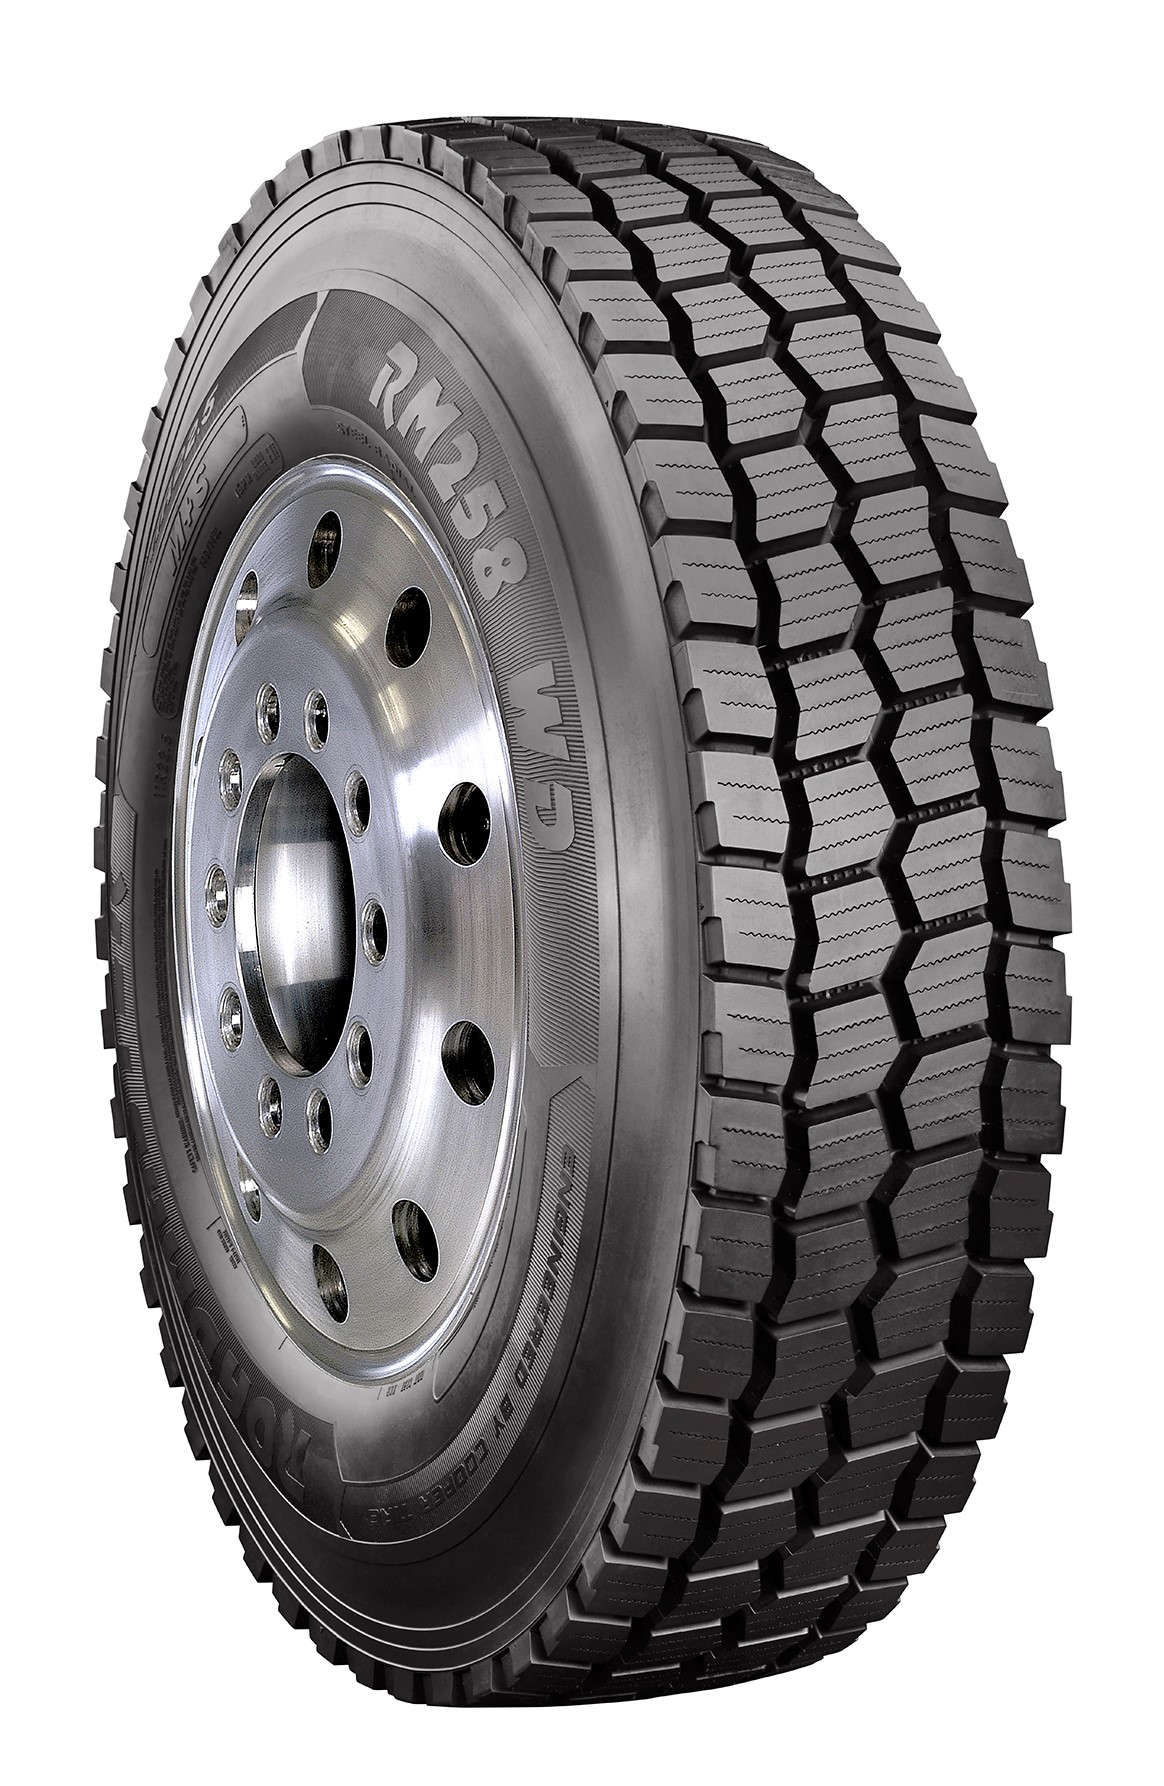 Cooper Adds Regional Haul Tire to Roadmaster Line